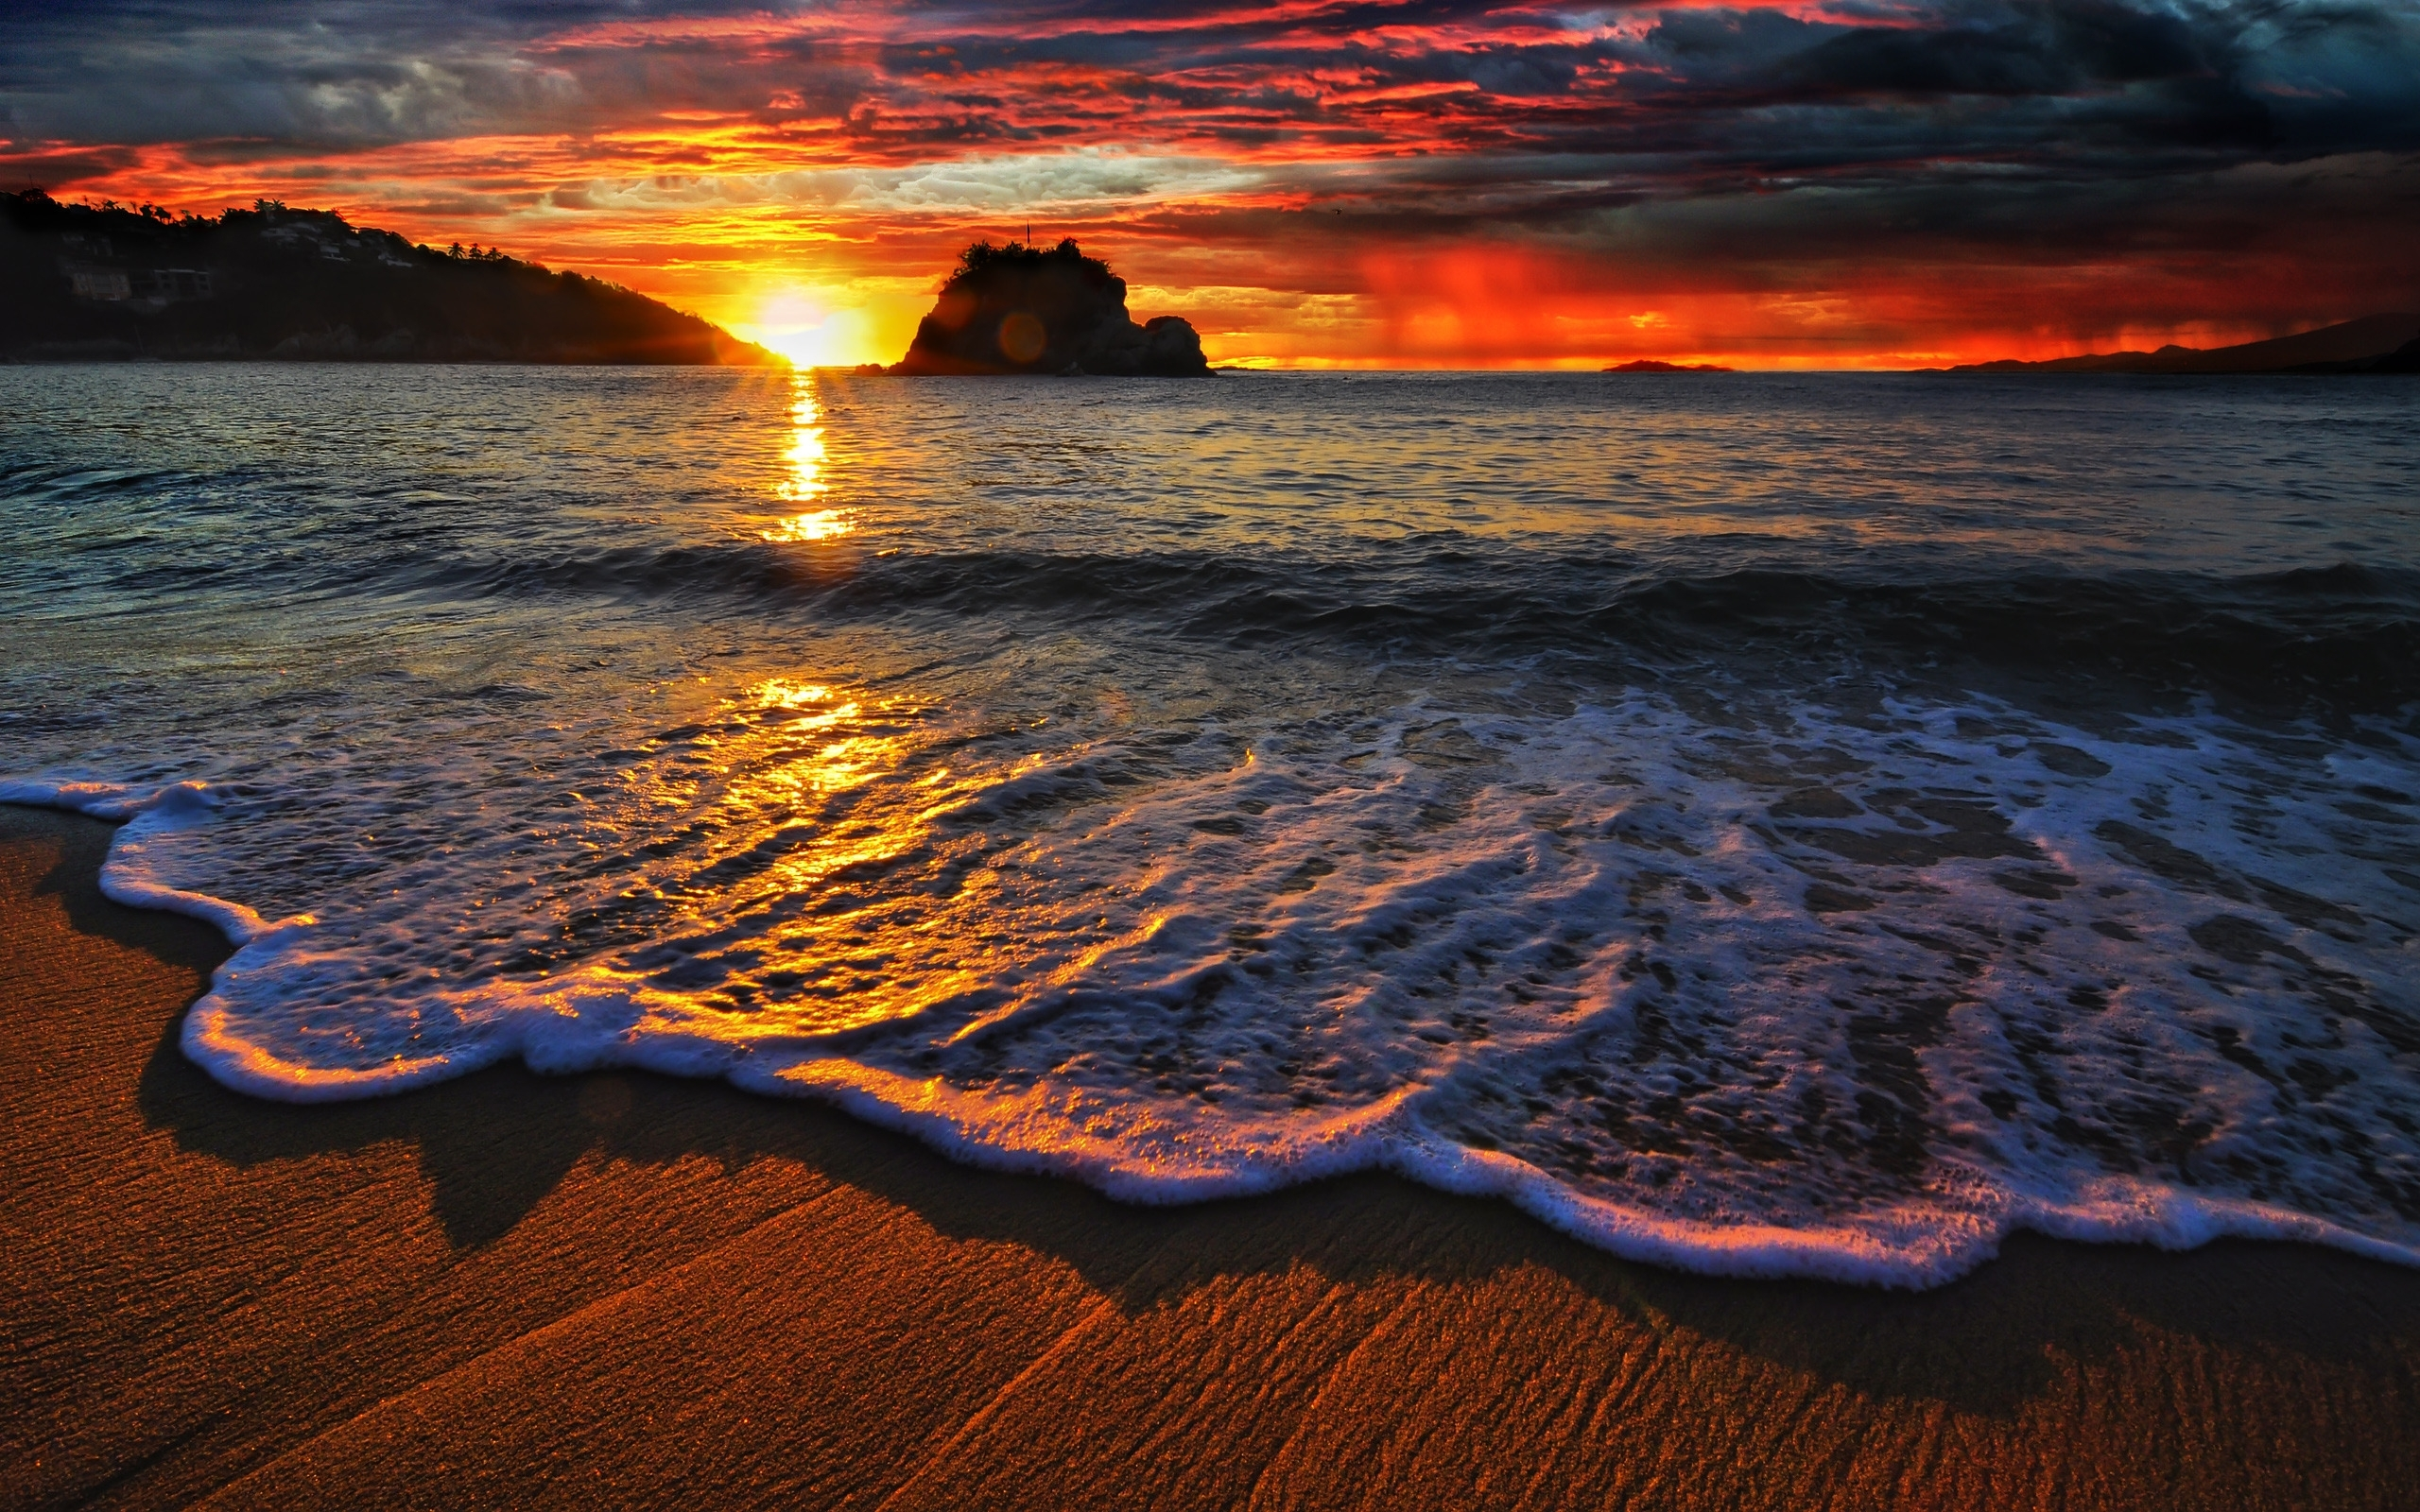 nature & landscape amazing sunset wallpapers (desktop, phone, tablet